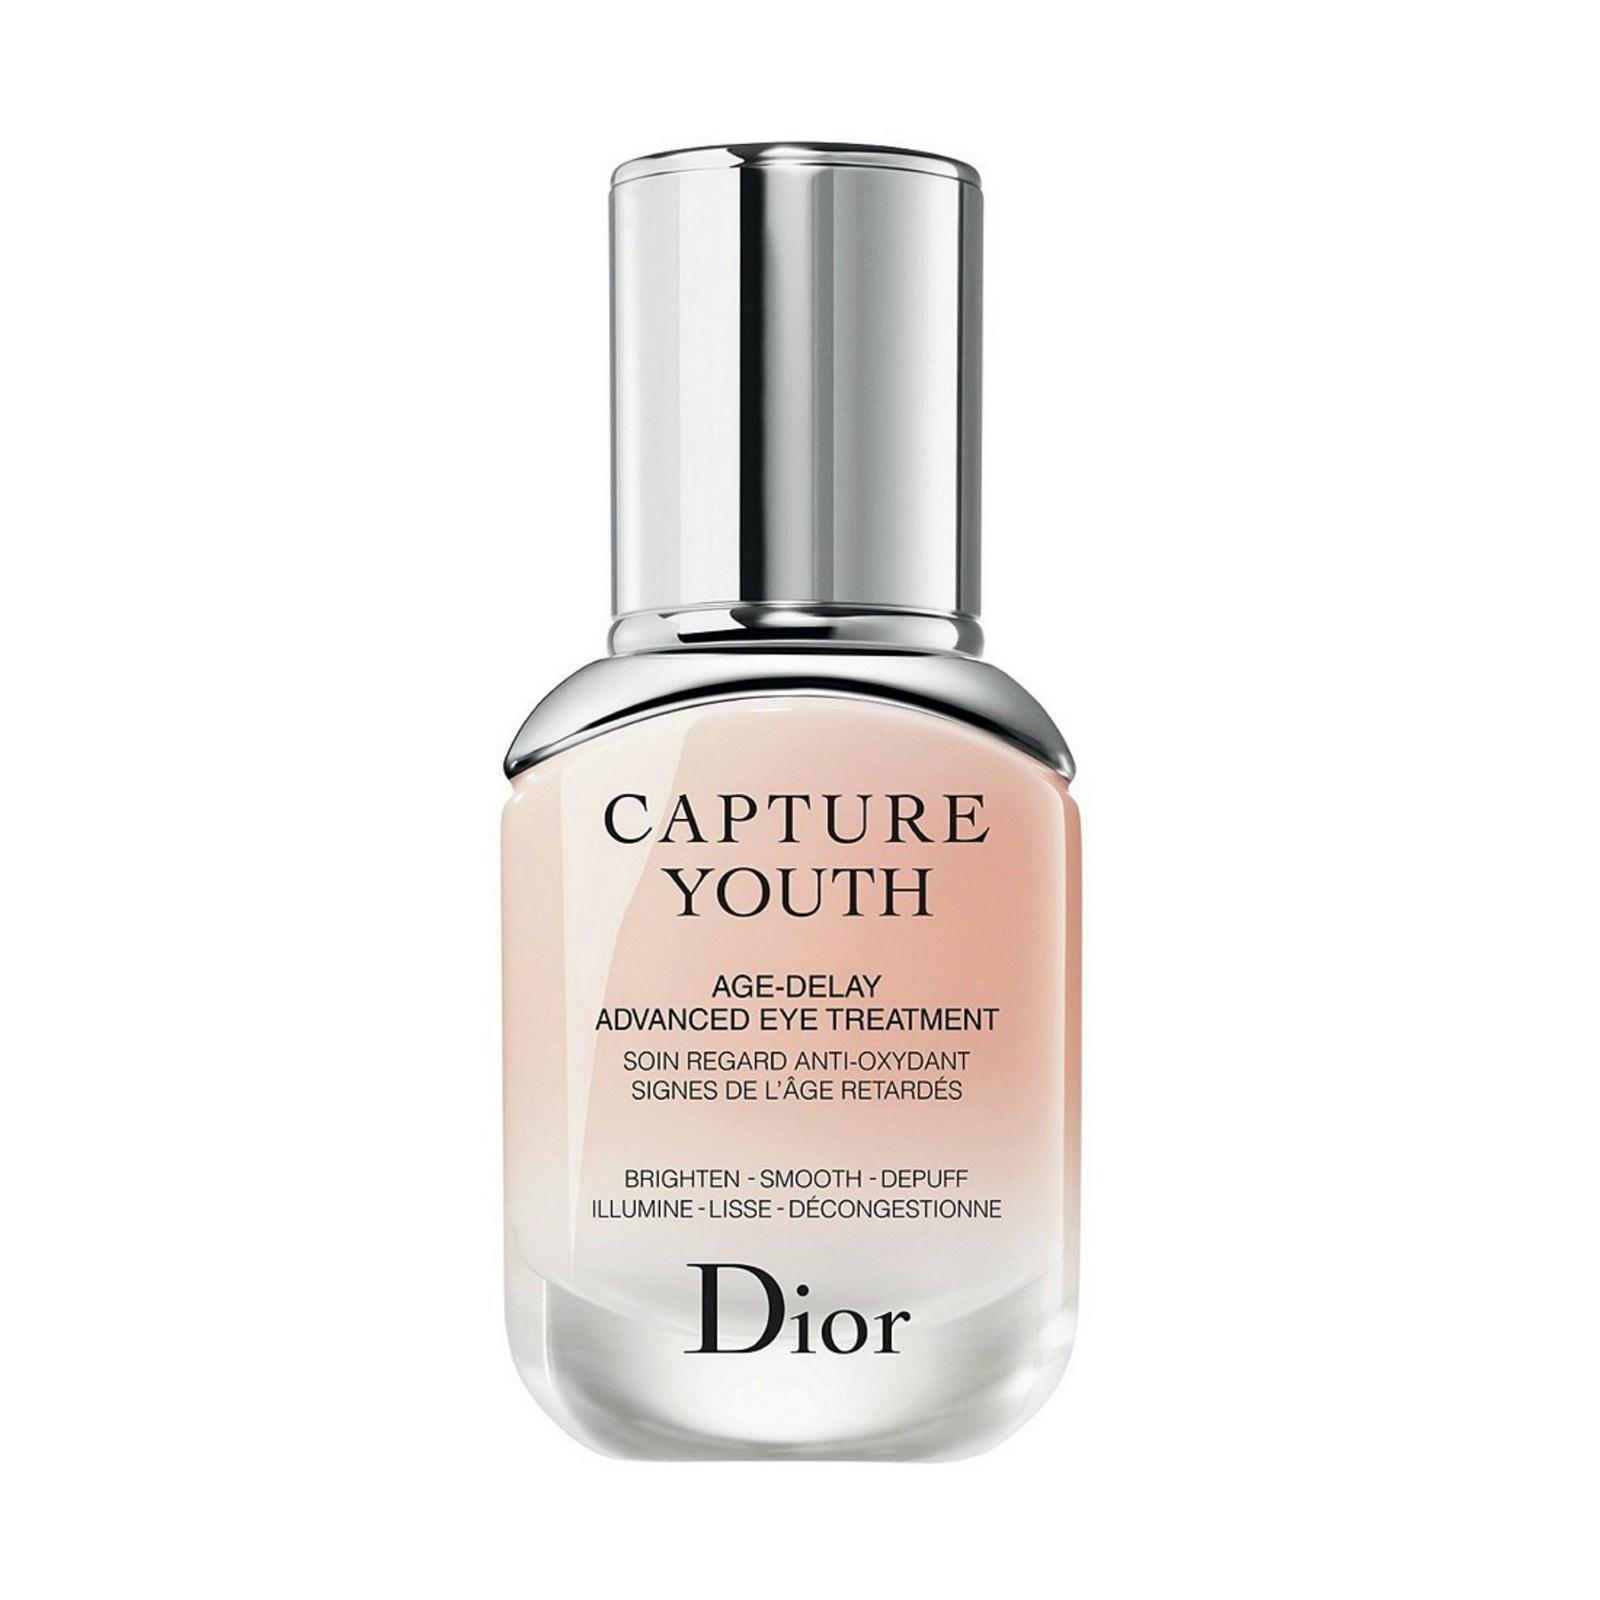 Dior Capture Youth Age Delay Advanced Eye Treatment